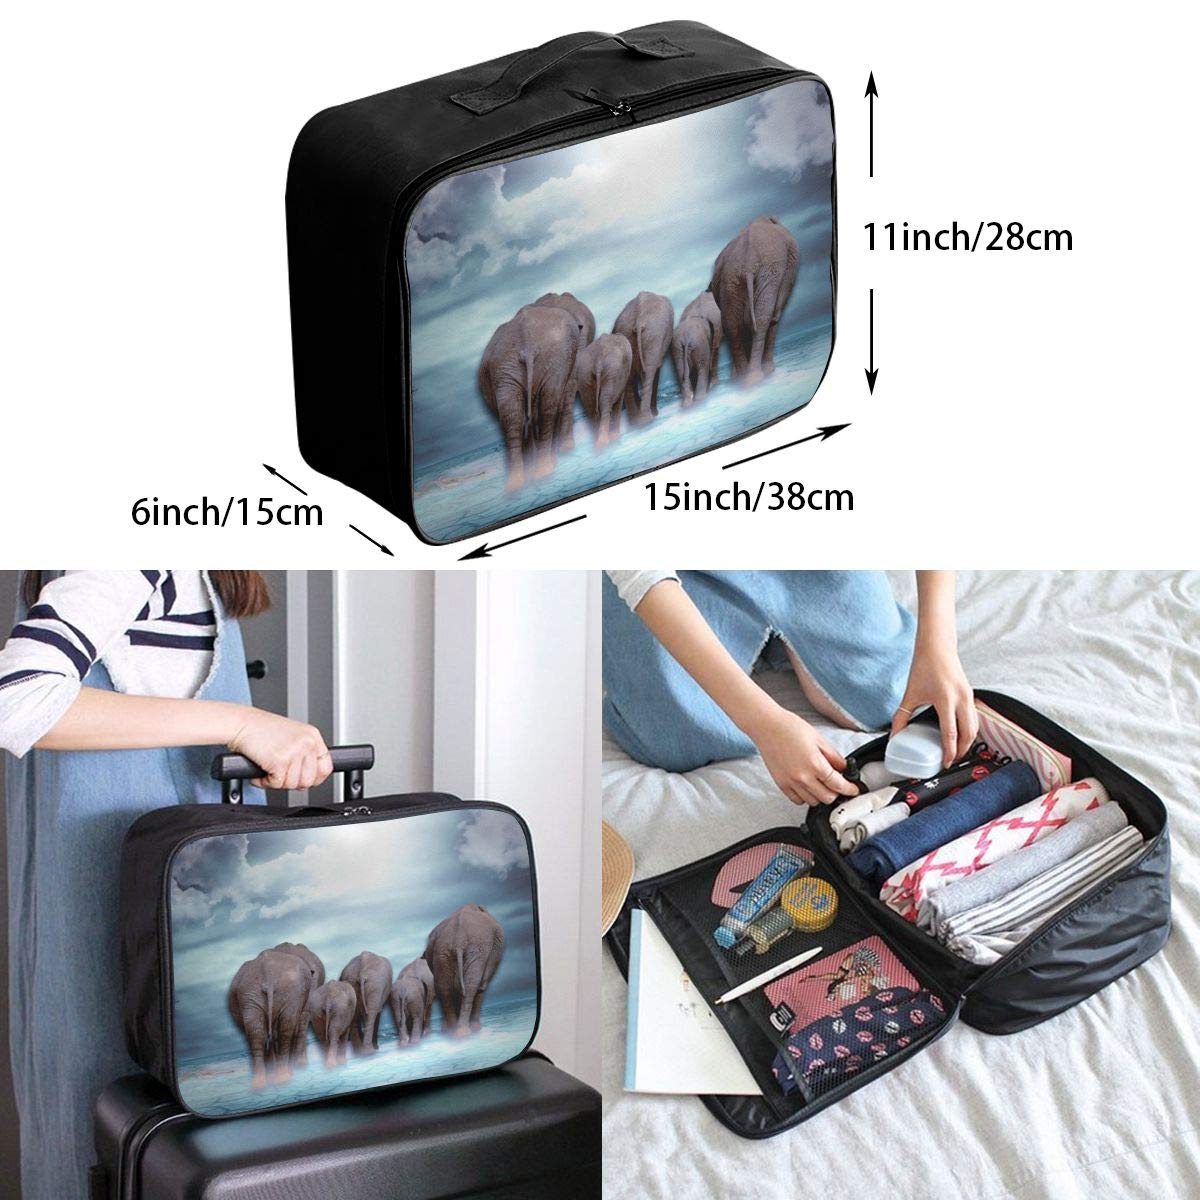 Travel Luggage Duffle Bag Lightweight Portable Handbag Elephant Large Capacity Waterproof Foldable Storage Tote